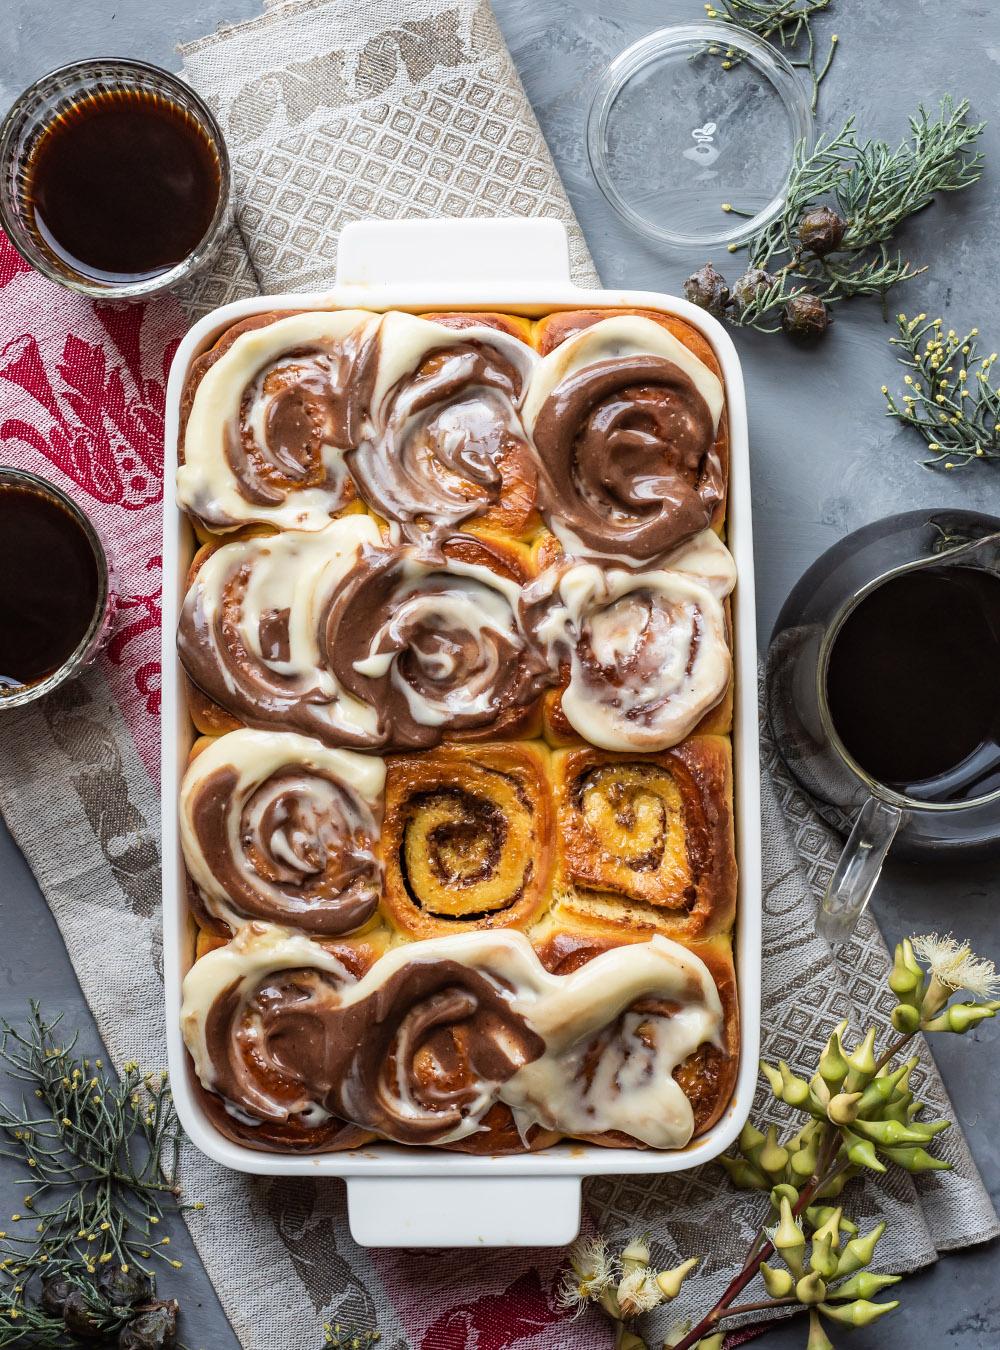 Safran Zimtschnecken mit Kaffeeguss - Overnight Cinnamon Rolls